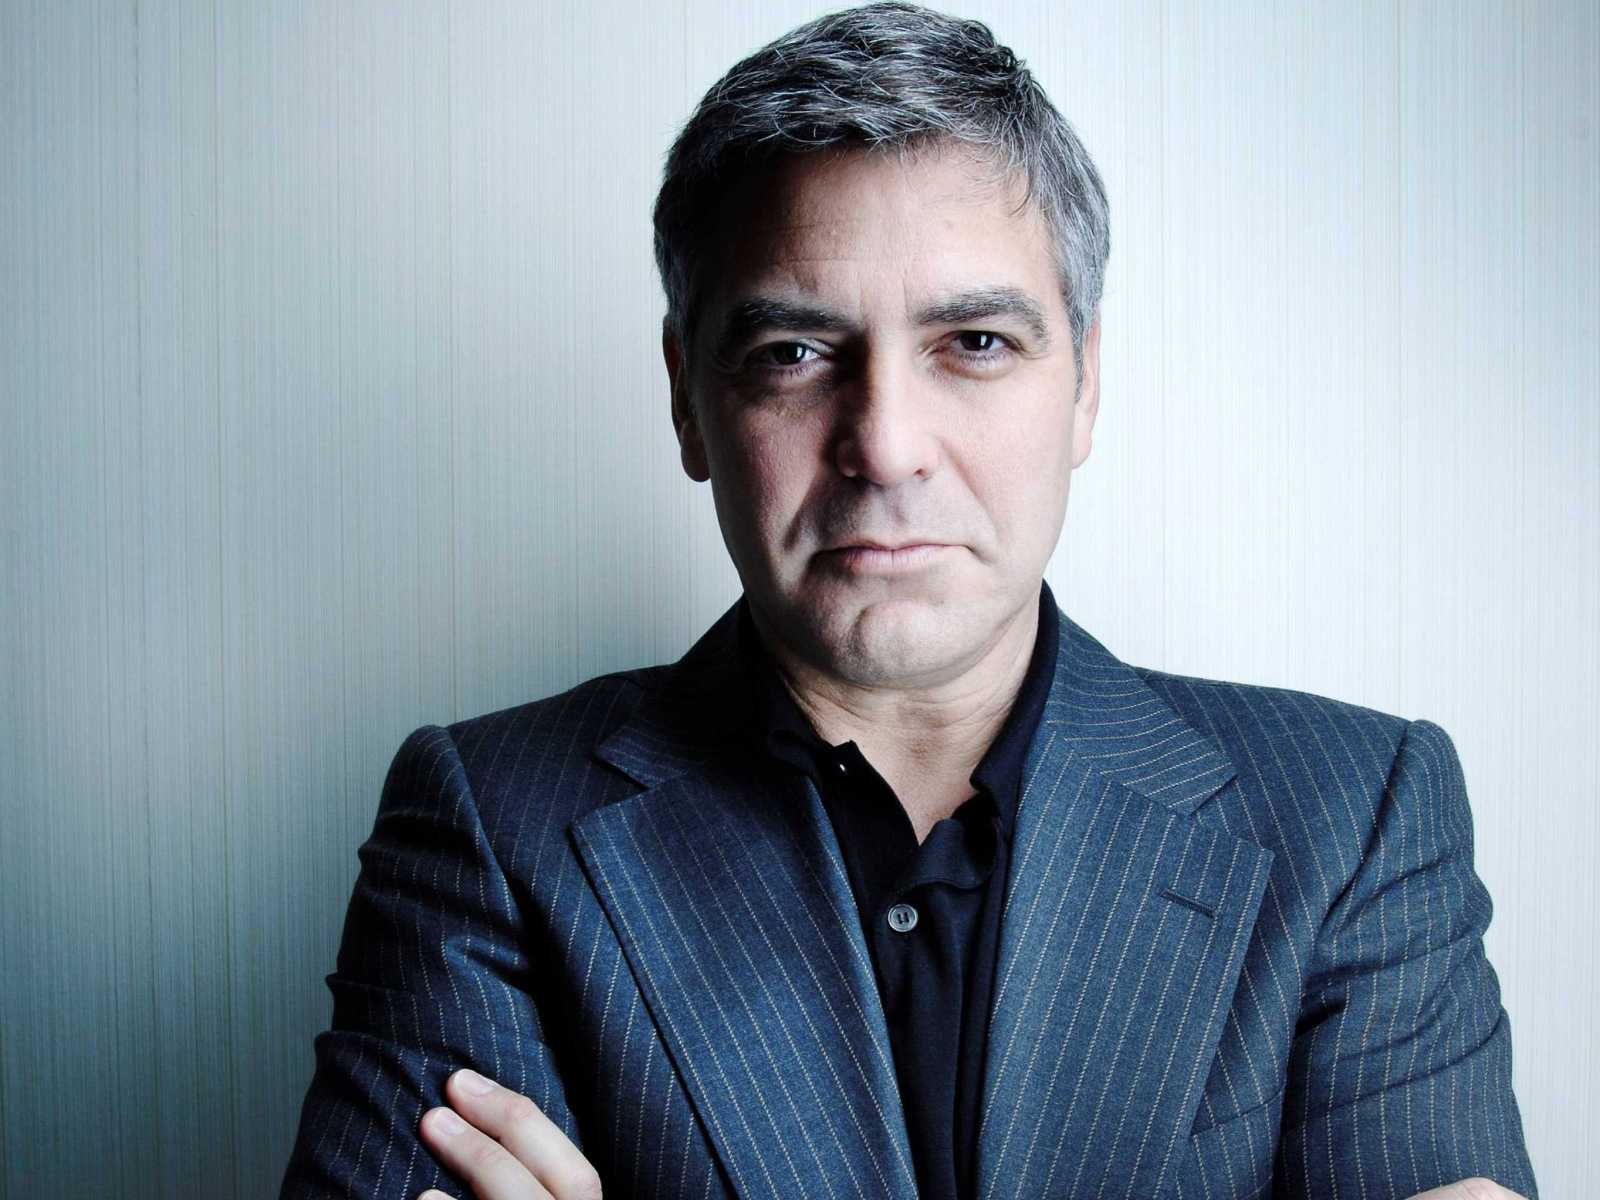 Джорж Клуни - методика обучения монтессори